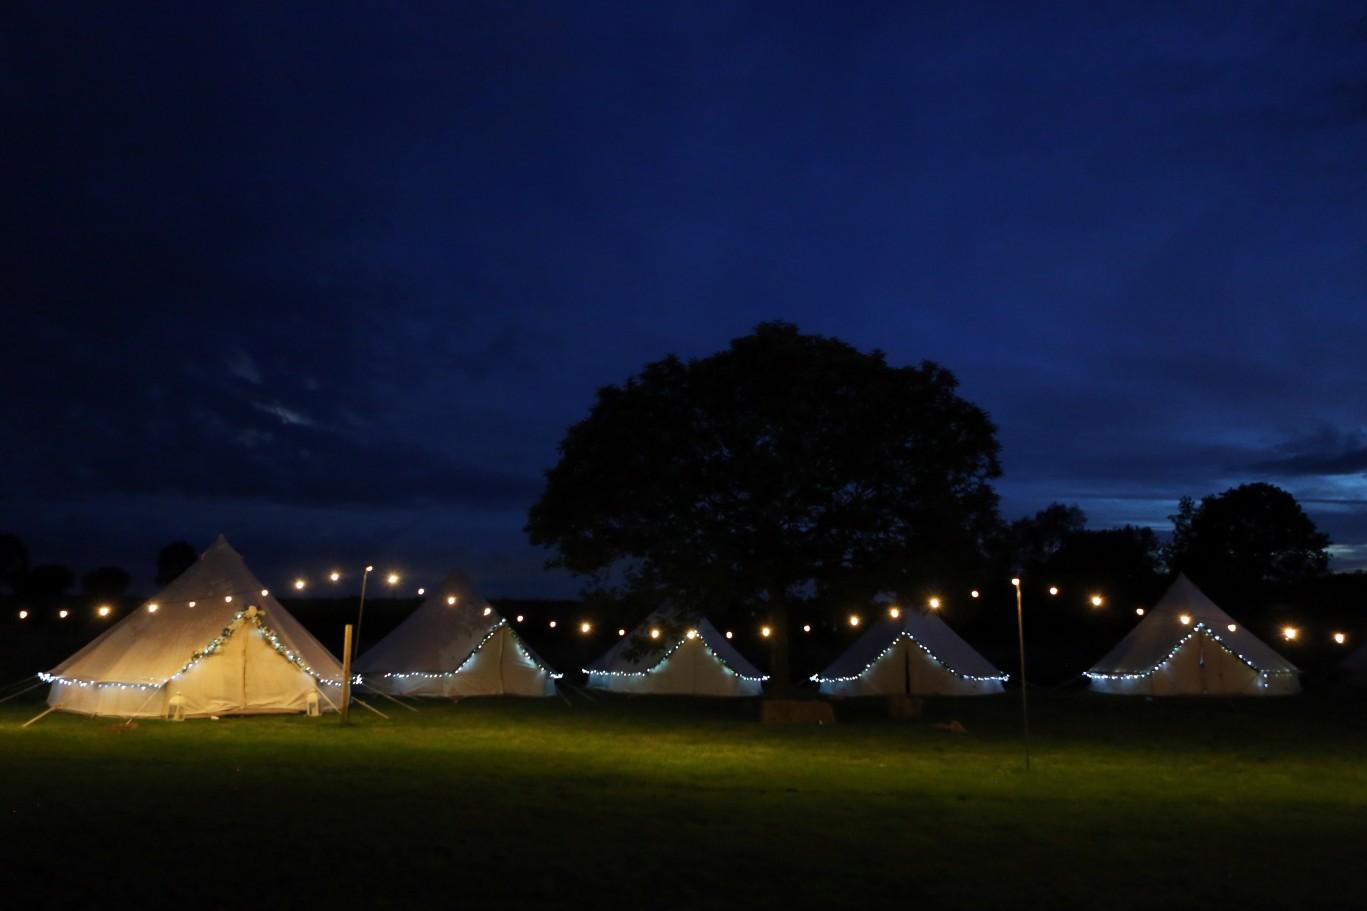 festival wedding inspiration - wedding tipis - festival wedding glamping